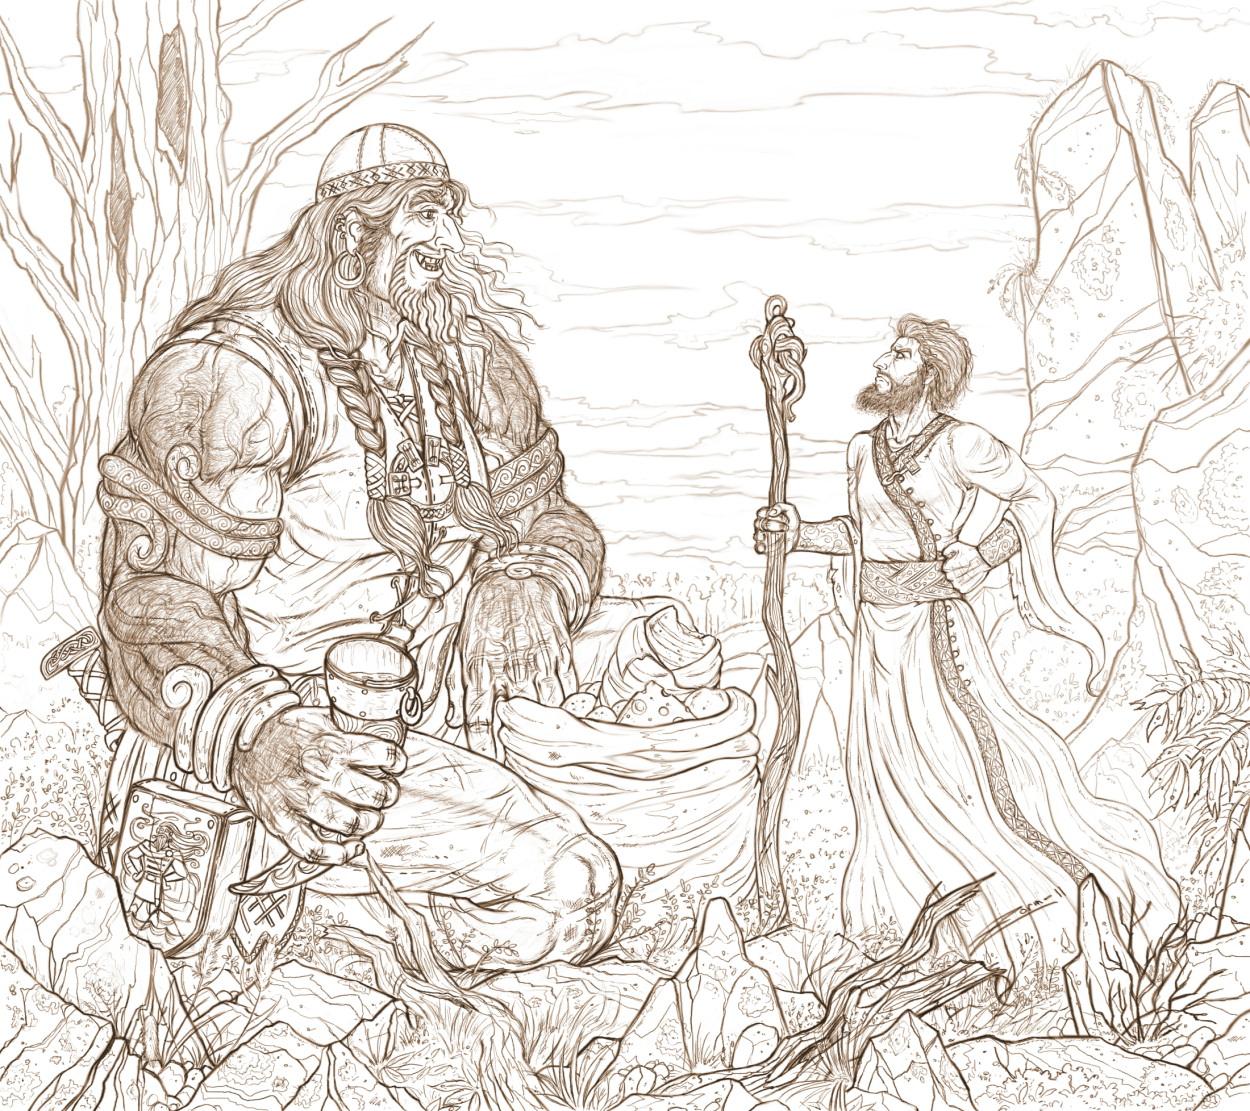 Saltheart and TC